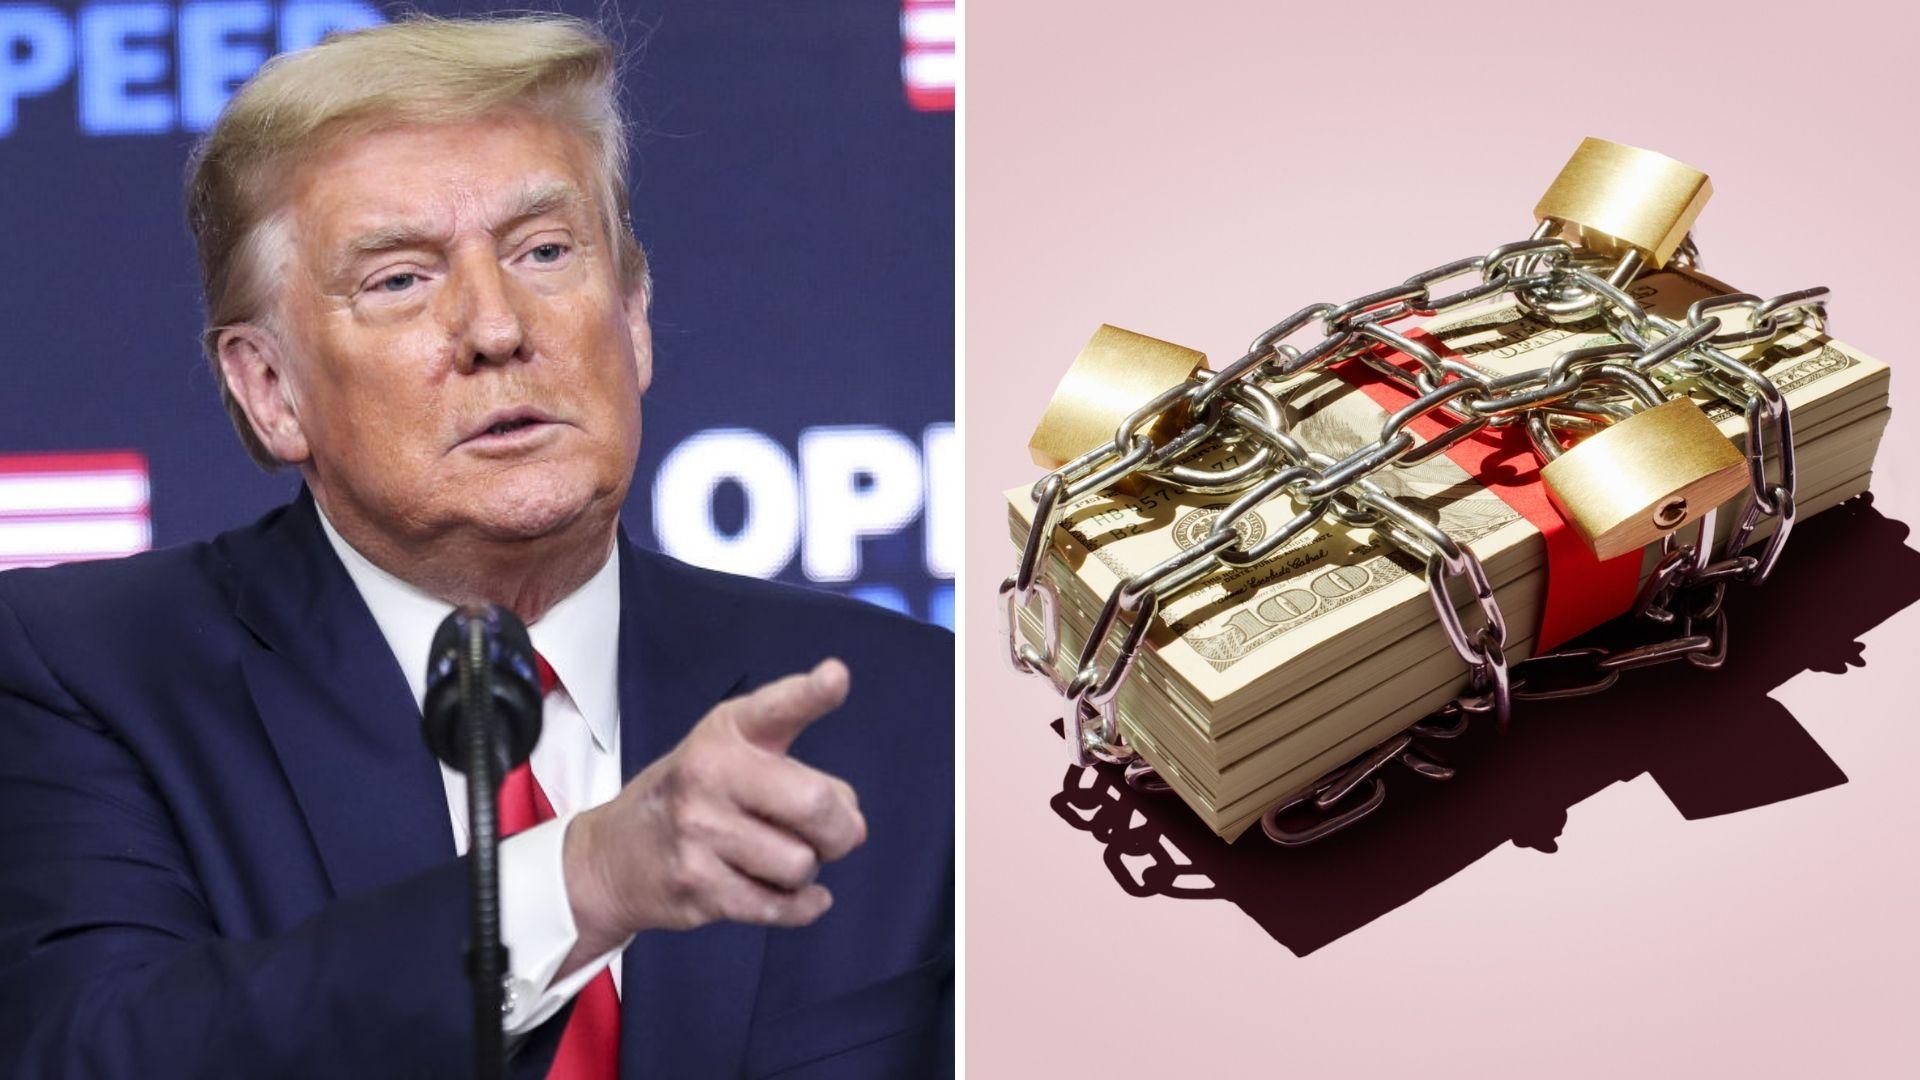 Major bank deals Trump billion-dollar blow after election warning